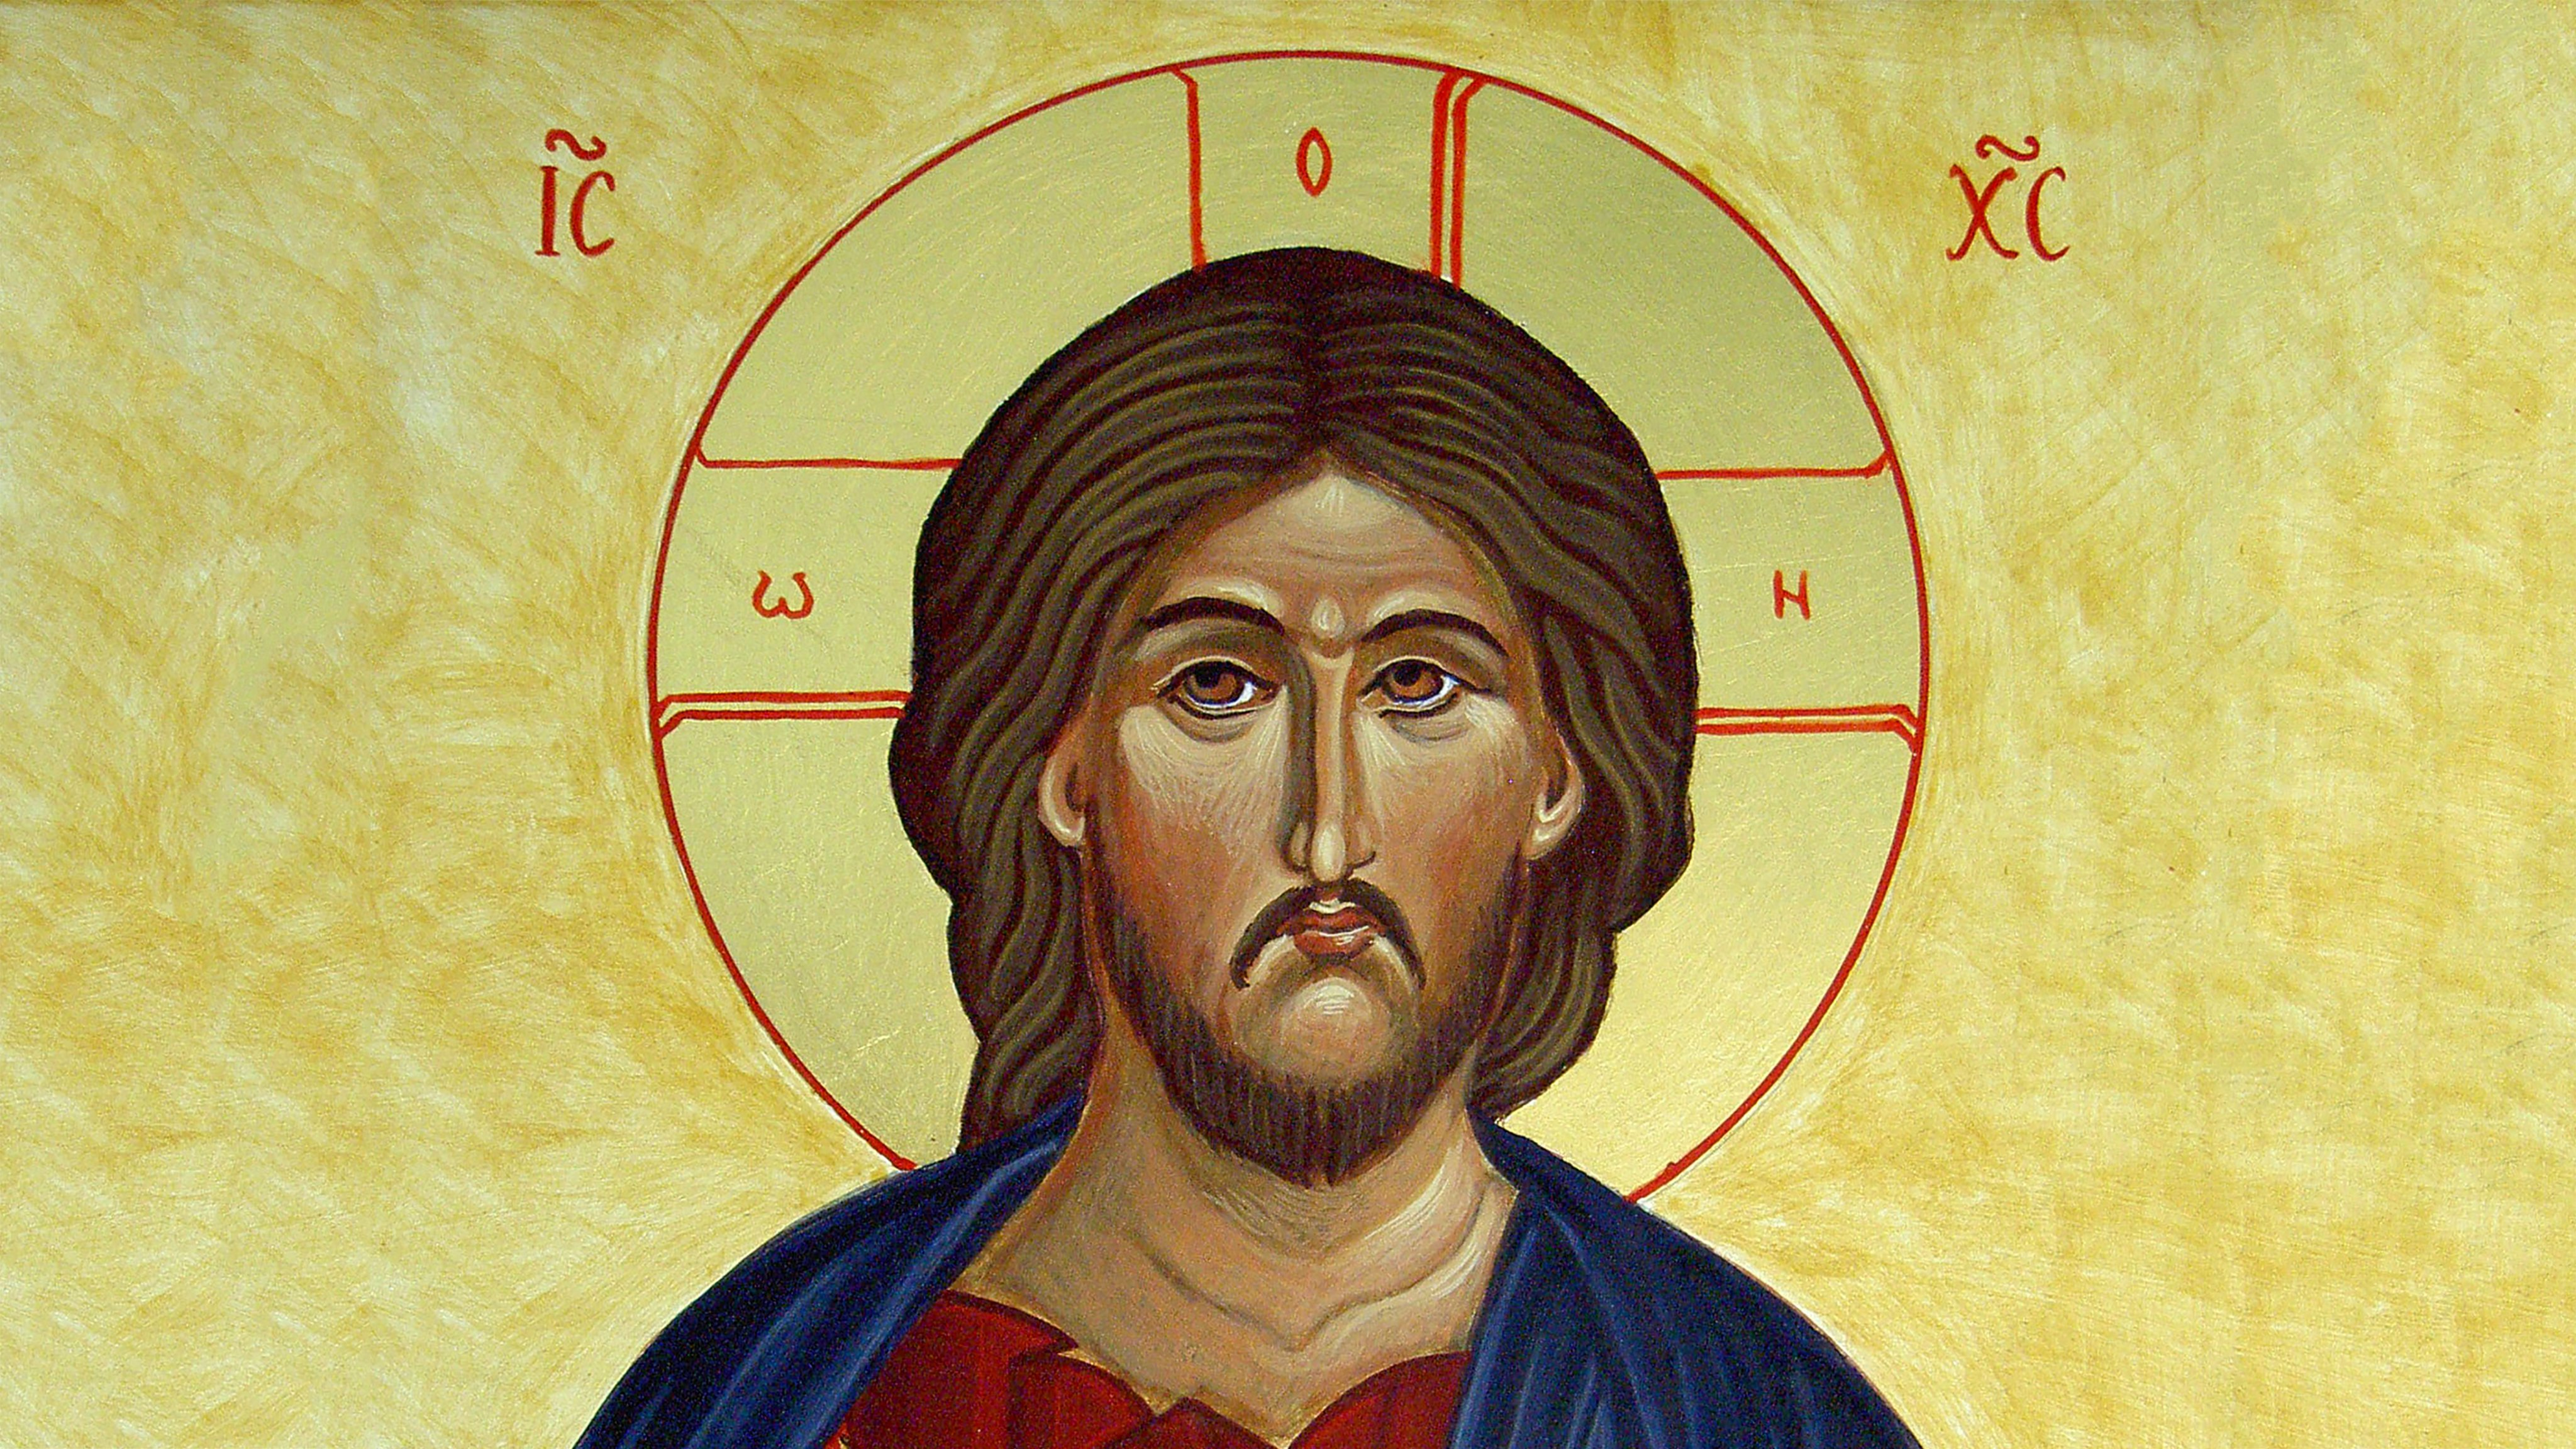 Wallpaper Cristo Pantocrator